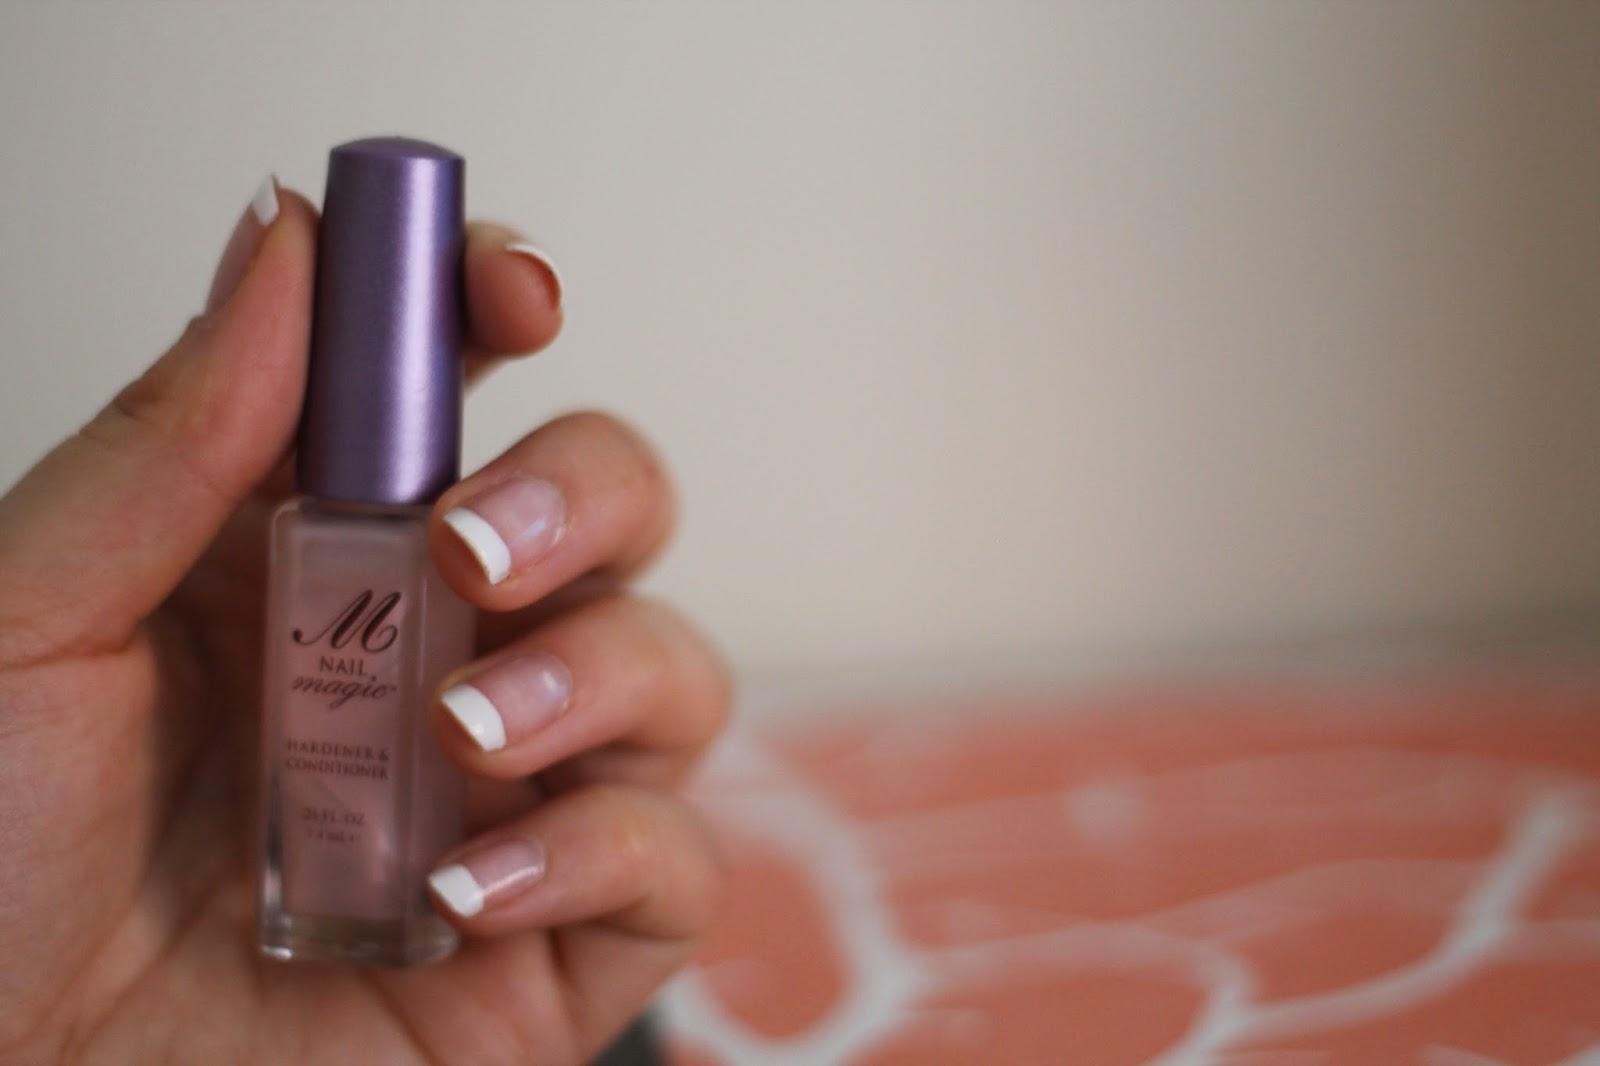 M Nail Magic Review | Charli Blogs